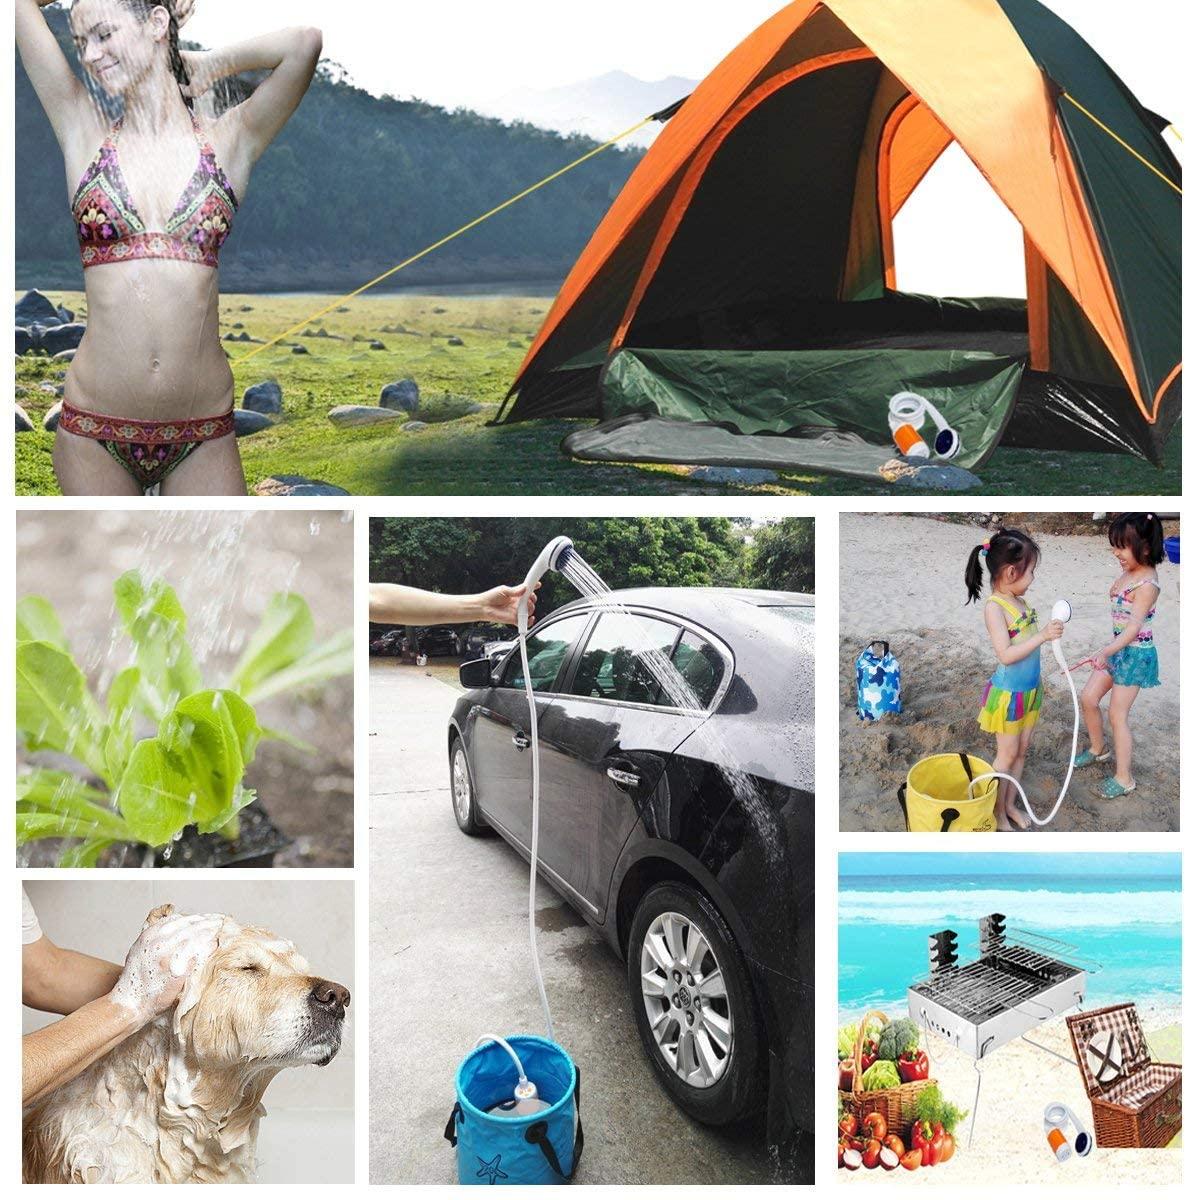 2020 New Universal Car Washer Shower Set Portable Electric Pump Outdoor Camping Travel Car Washer Hiking Pet Washer душ походный